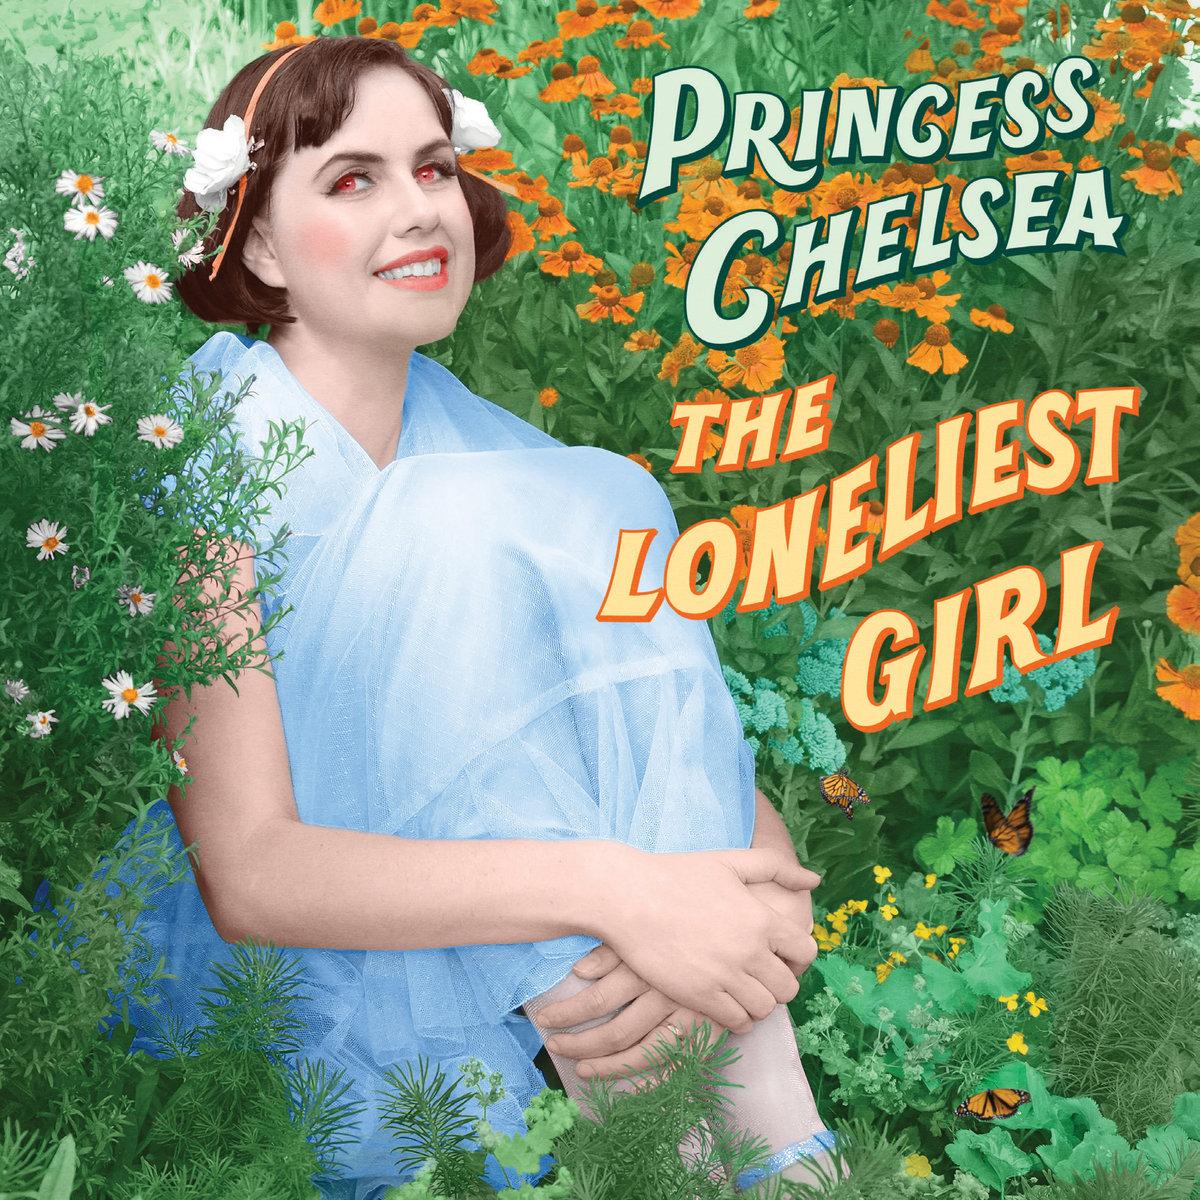 Princess Chelsea - The Loneliest Girl (2018)